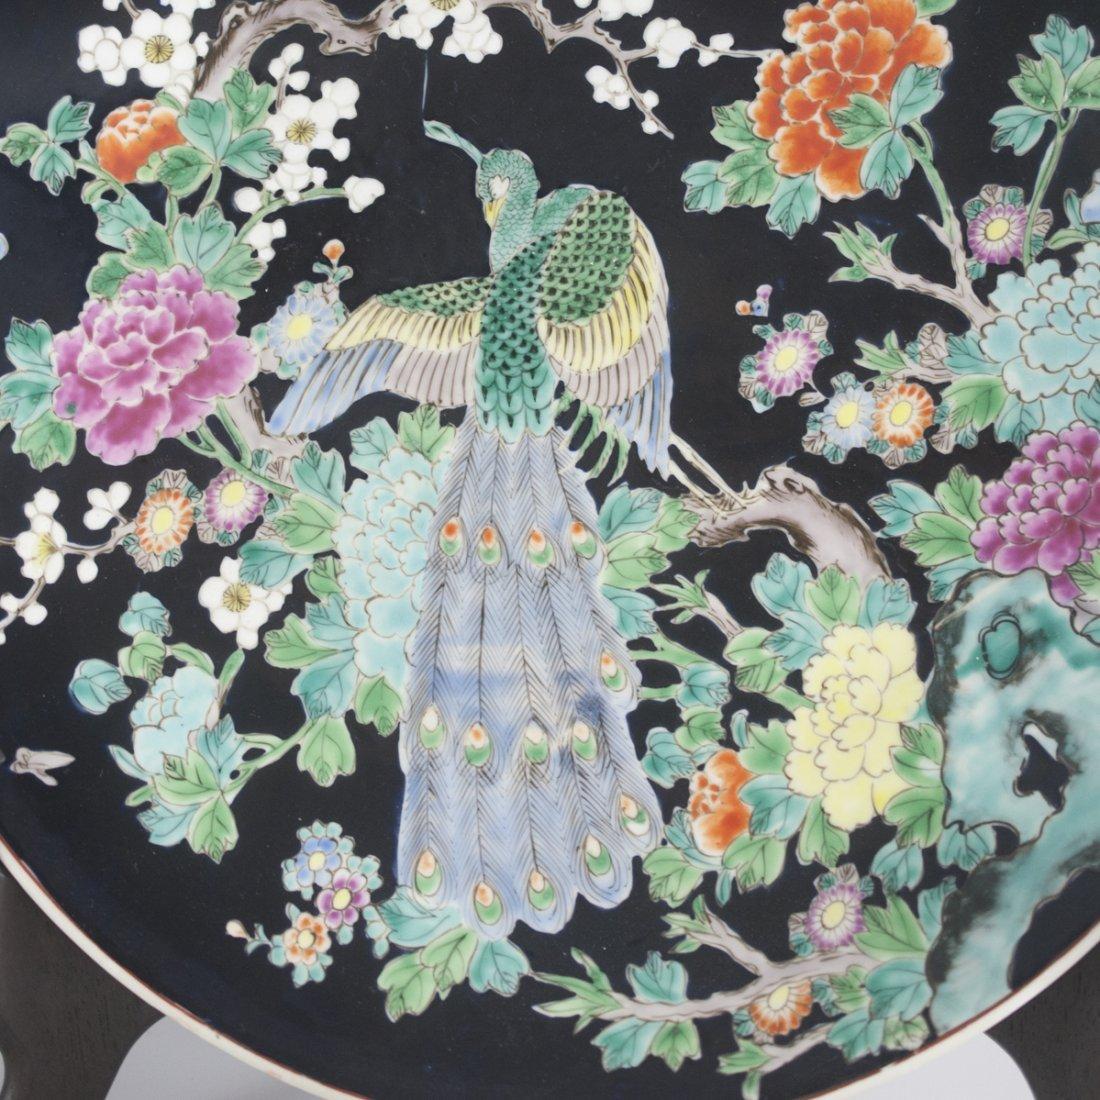 Japanese Famille Noire Porcelain Charger - 5